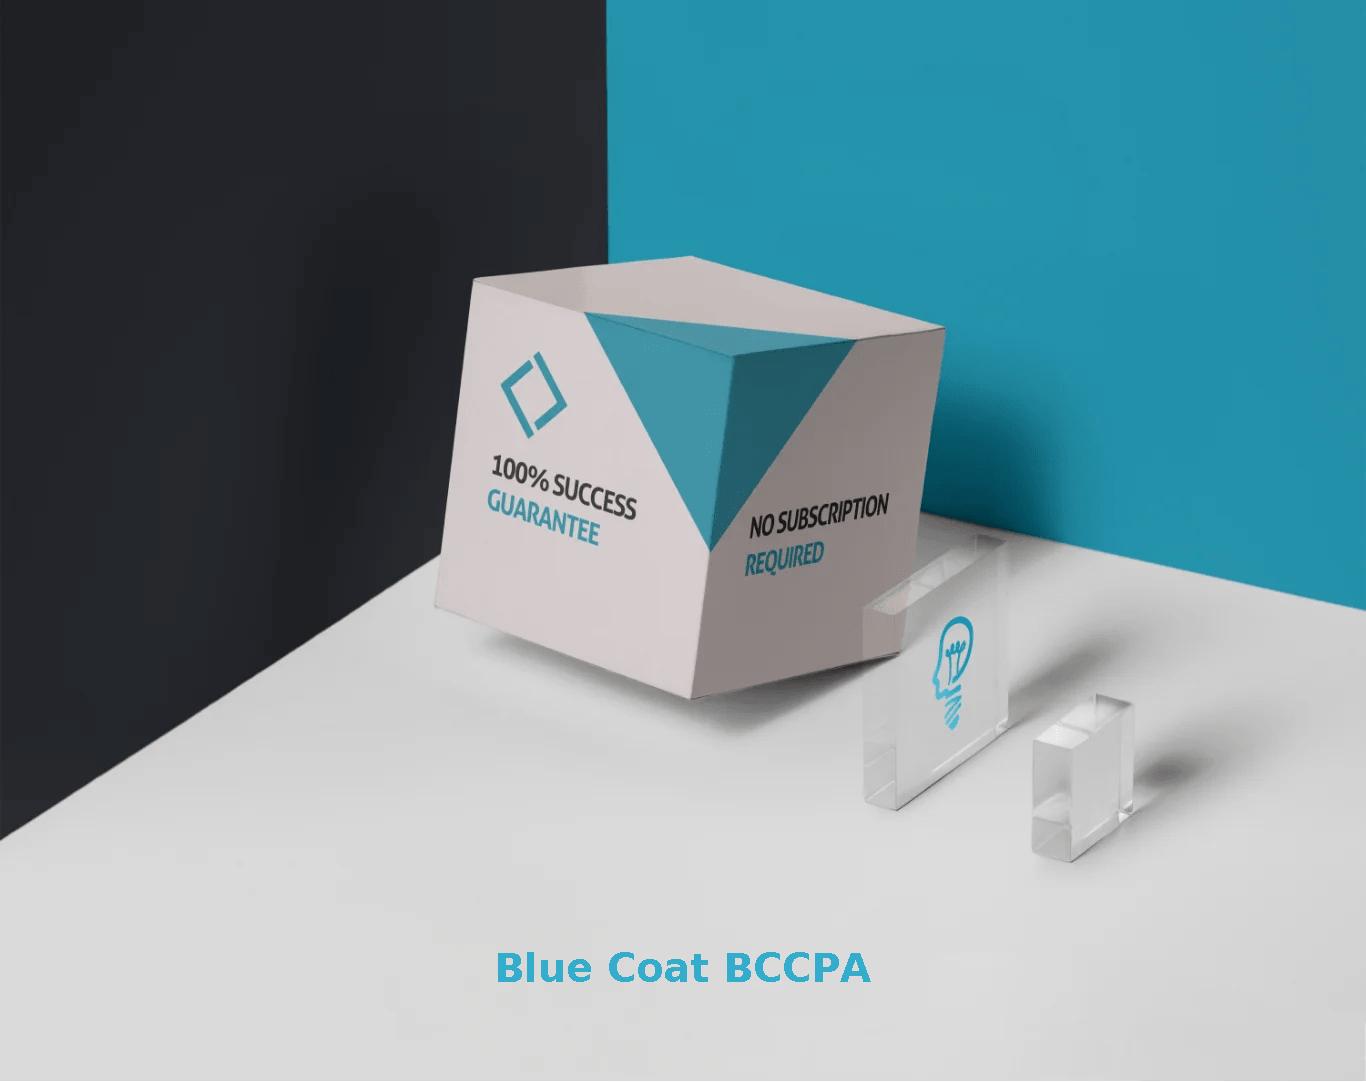 Blue Coat BCCPA Exams